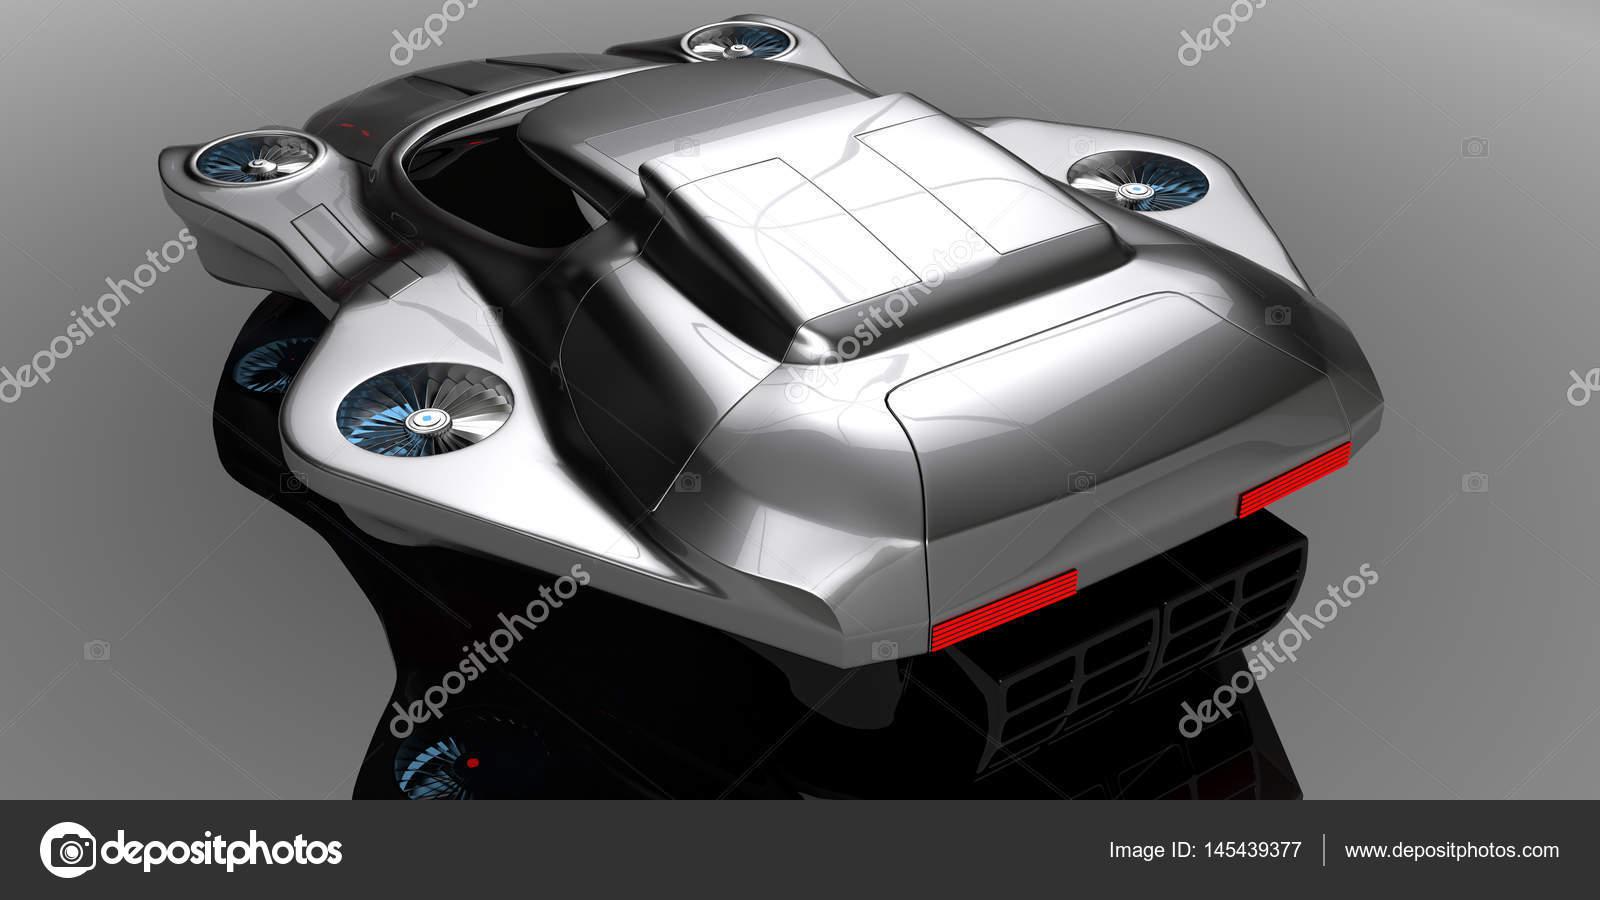 Konzept-Luft Maschinen Fahrzeugtechnologie — Stockfoto © Tratatushki ...